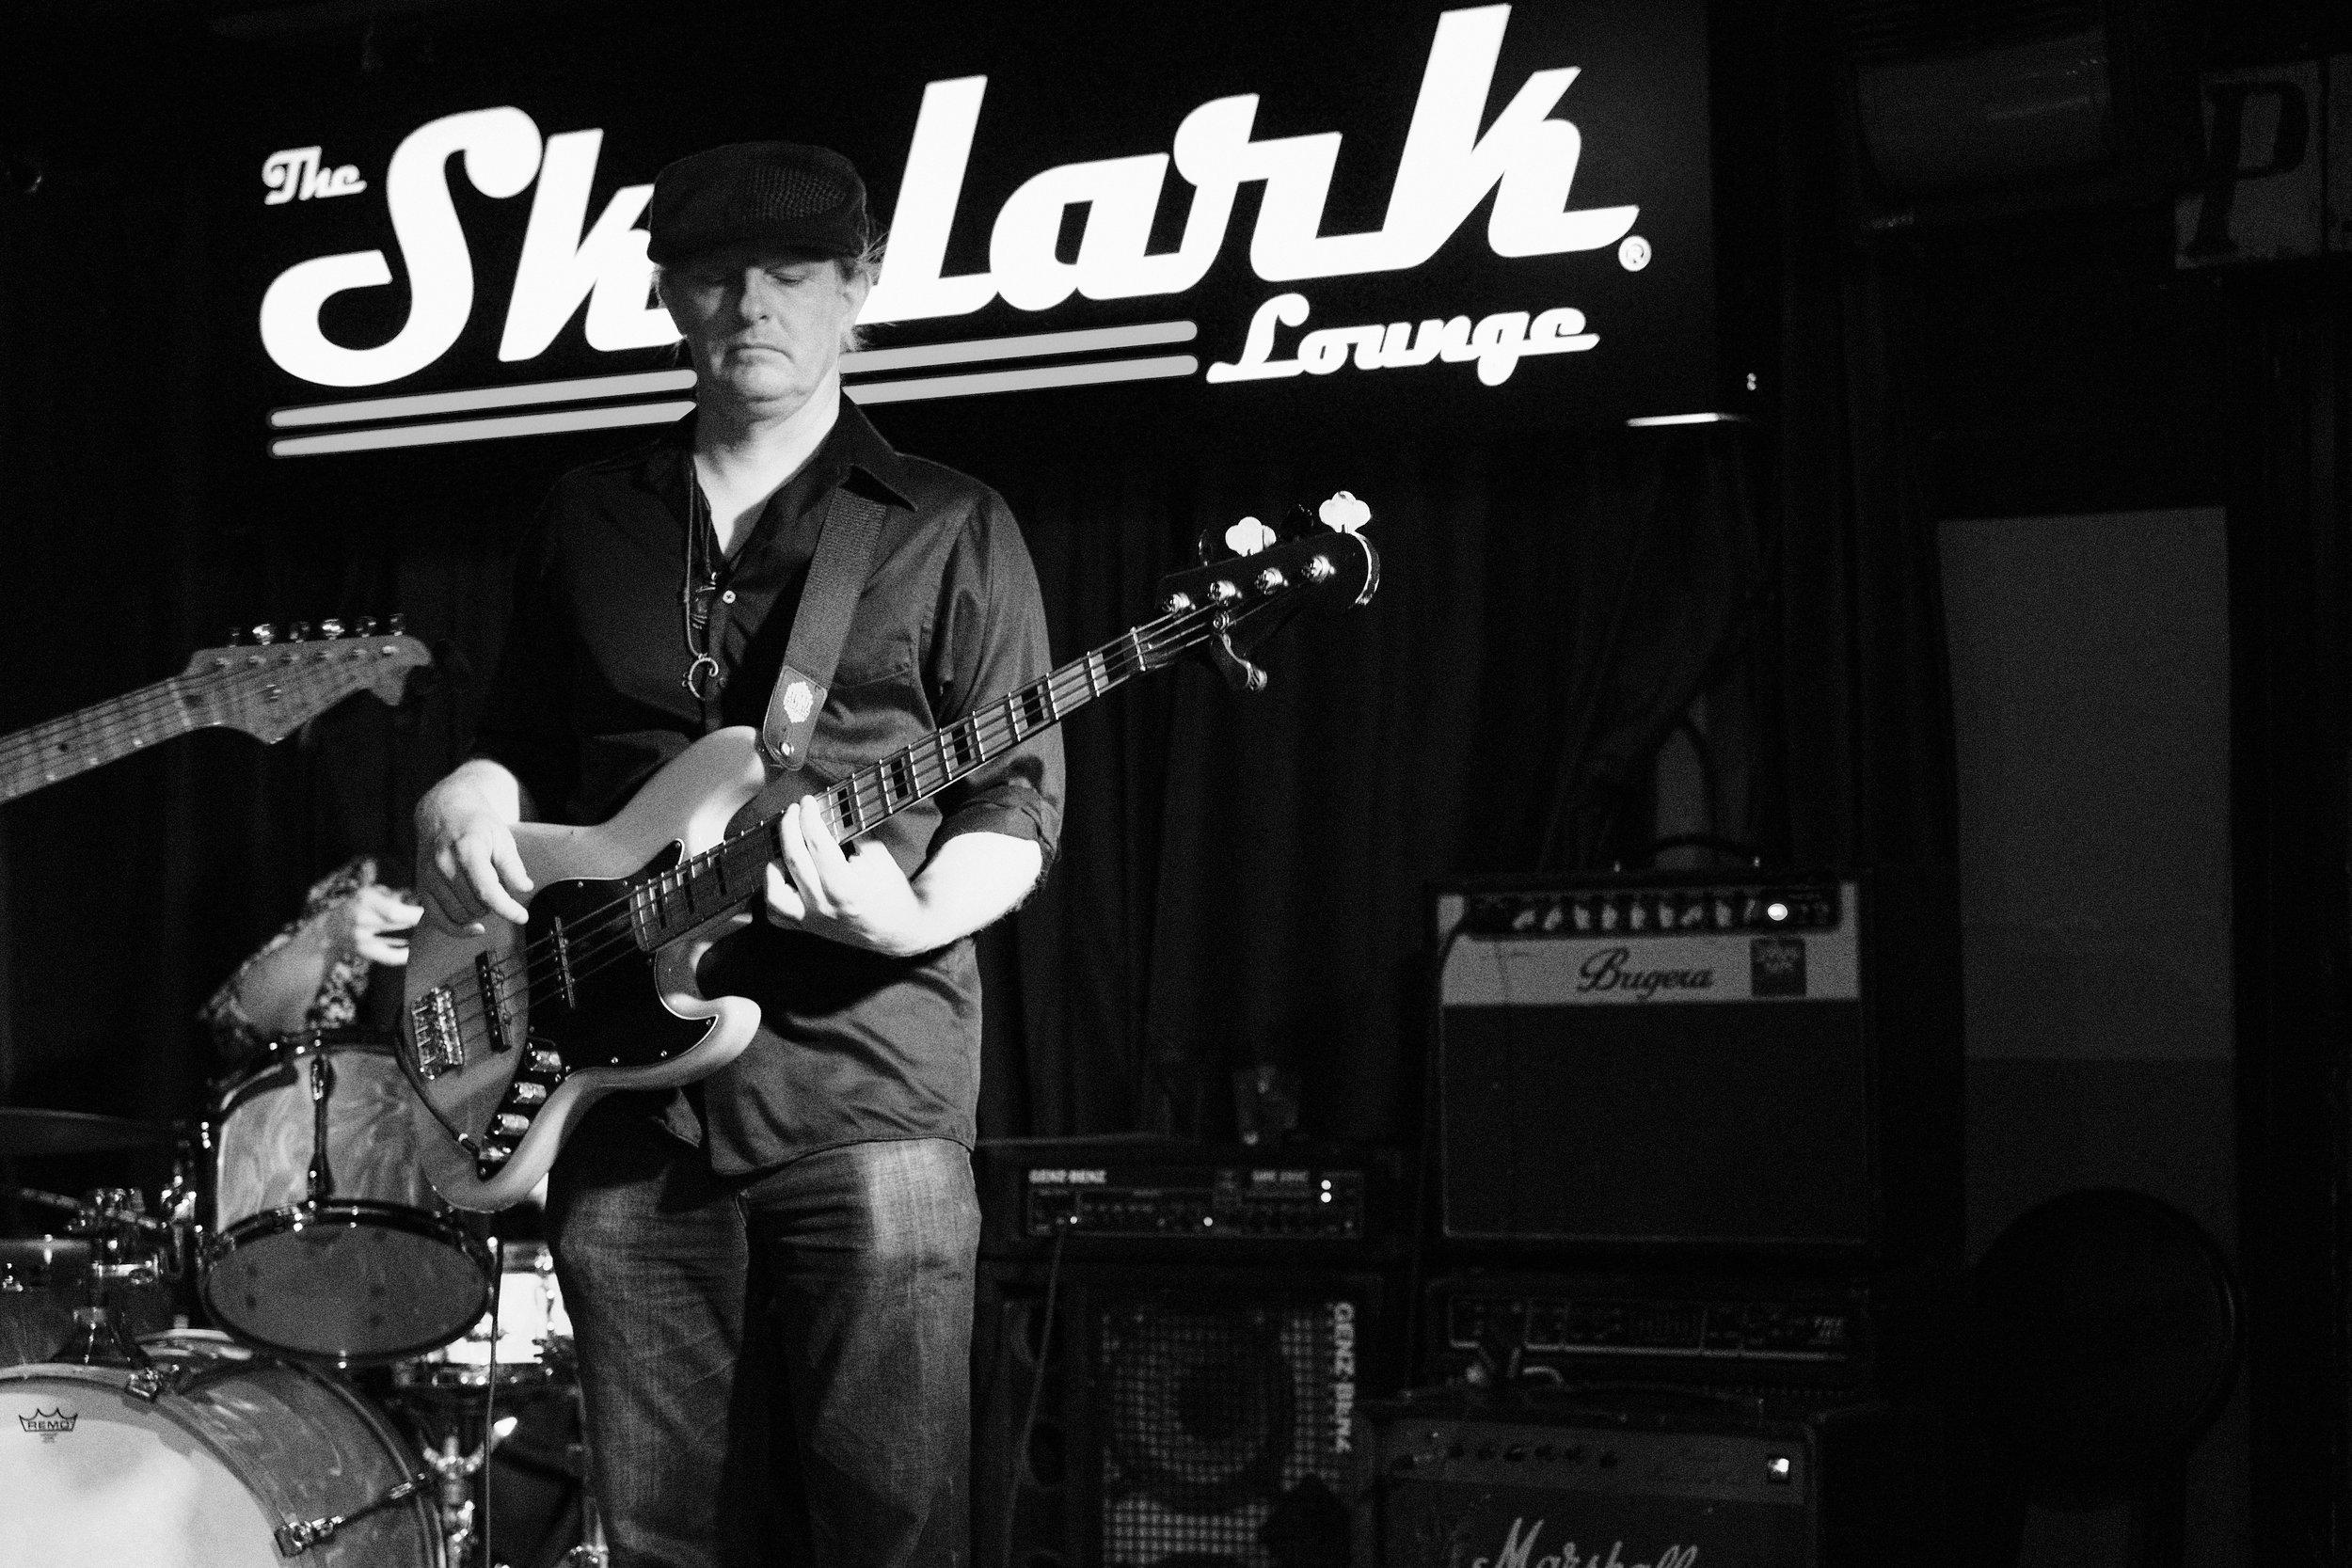 skylark-blues-jam-2016-2321.jpg